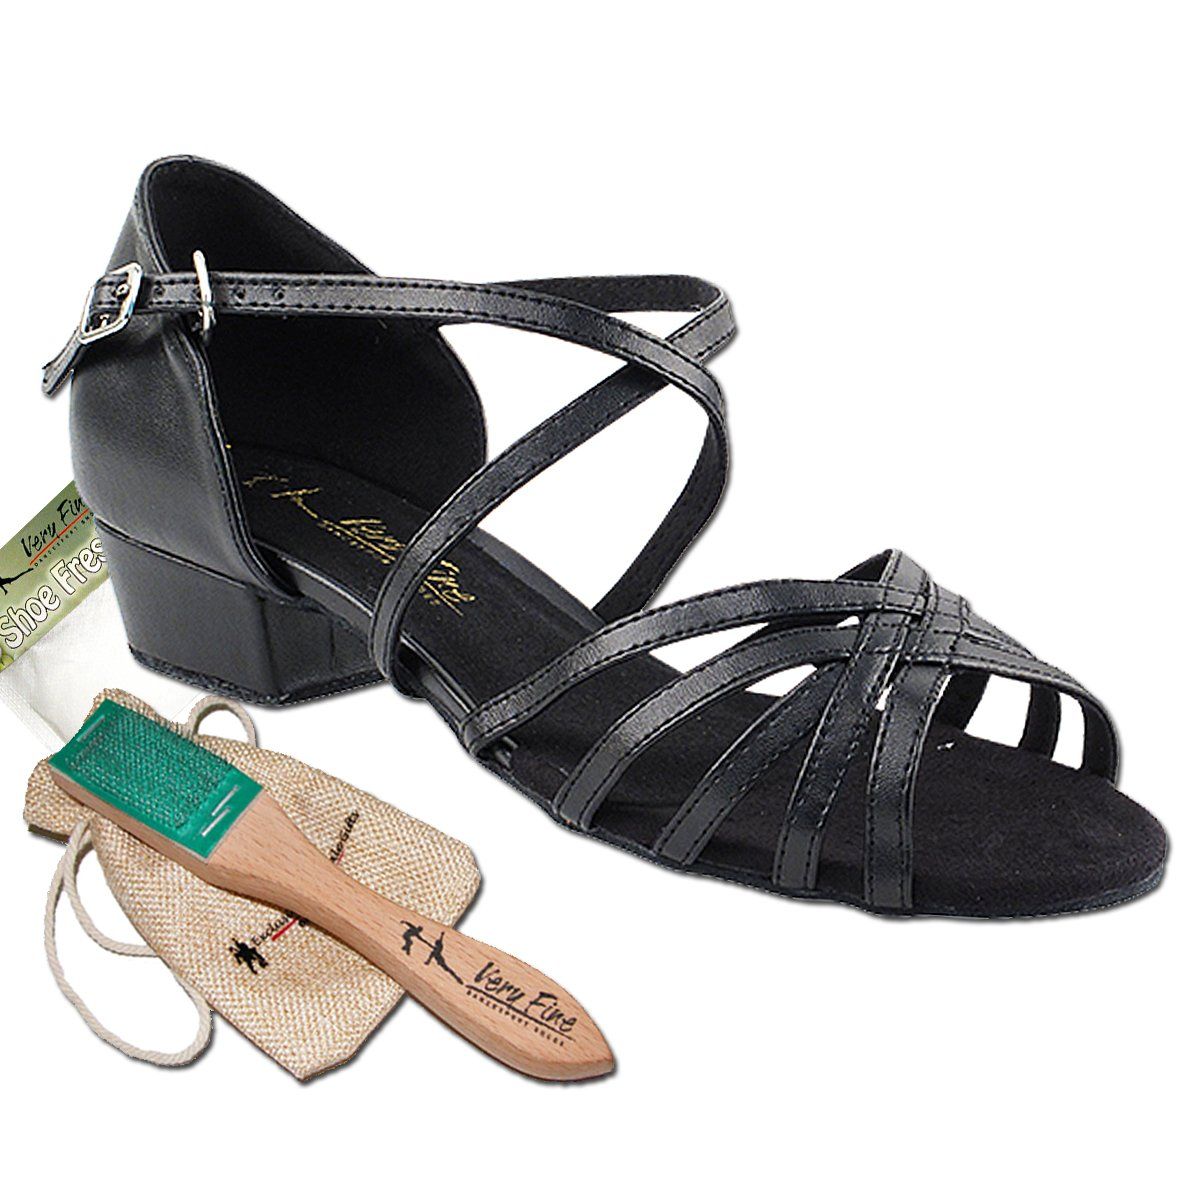 Women's Ballroom Dance Shoes Salsa Latin Practice Dance Shoes Black PU 1670FTEB Comfortable - Very Fine 1'' Heel 8 M US [Bundle of 5]